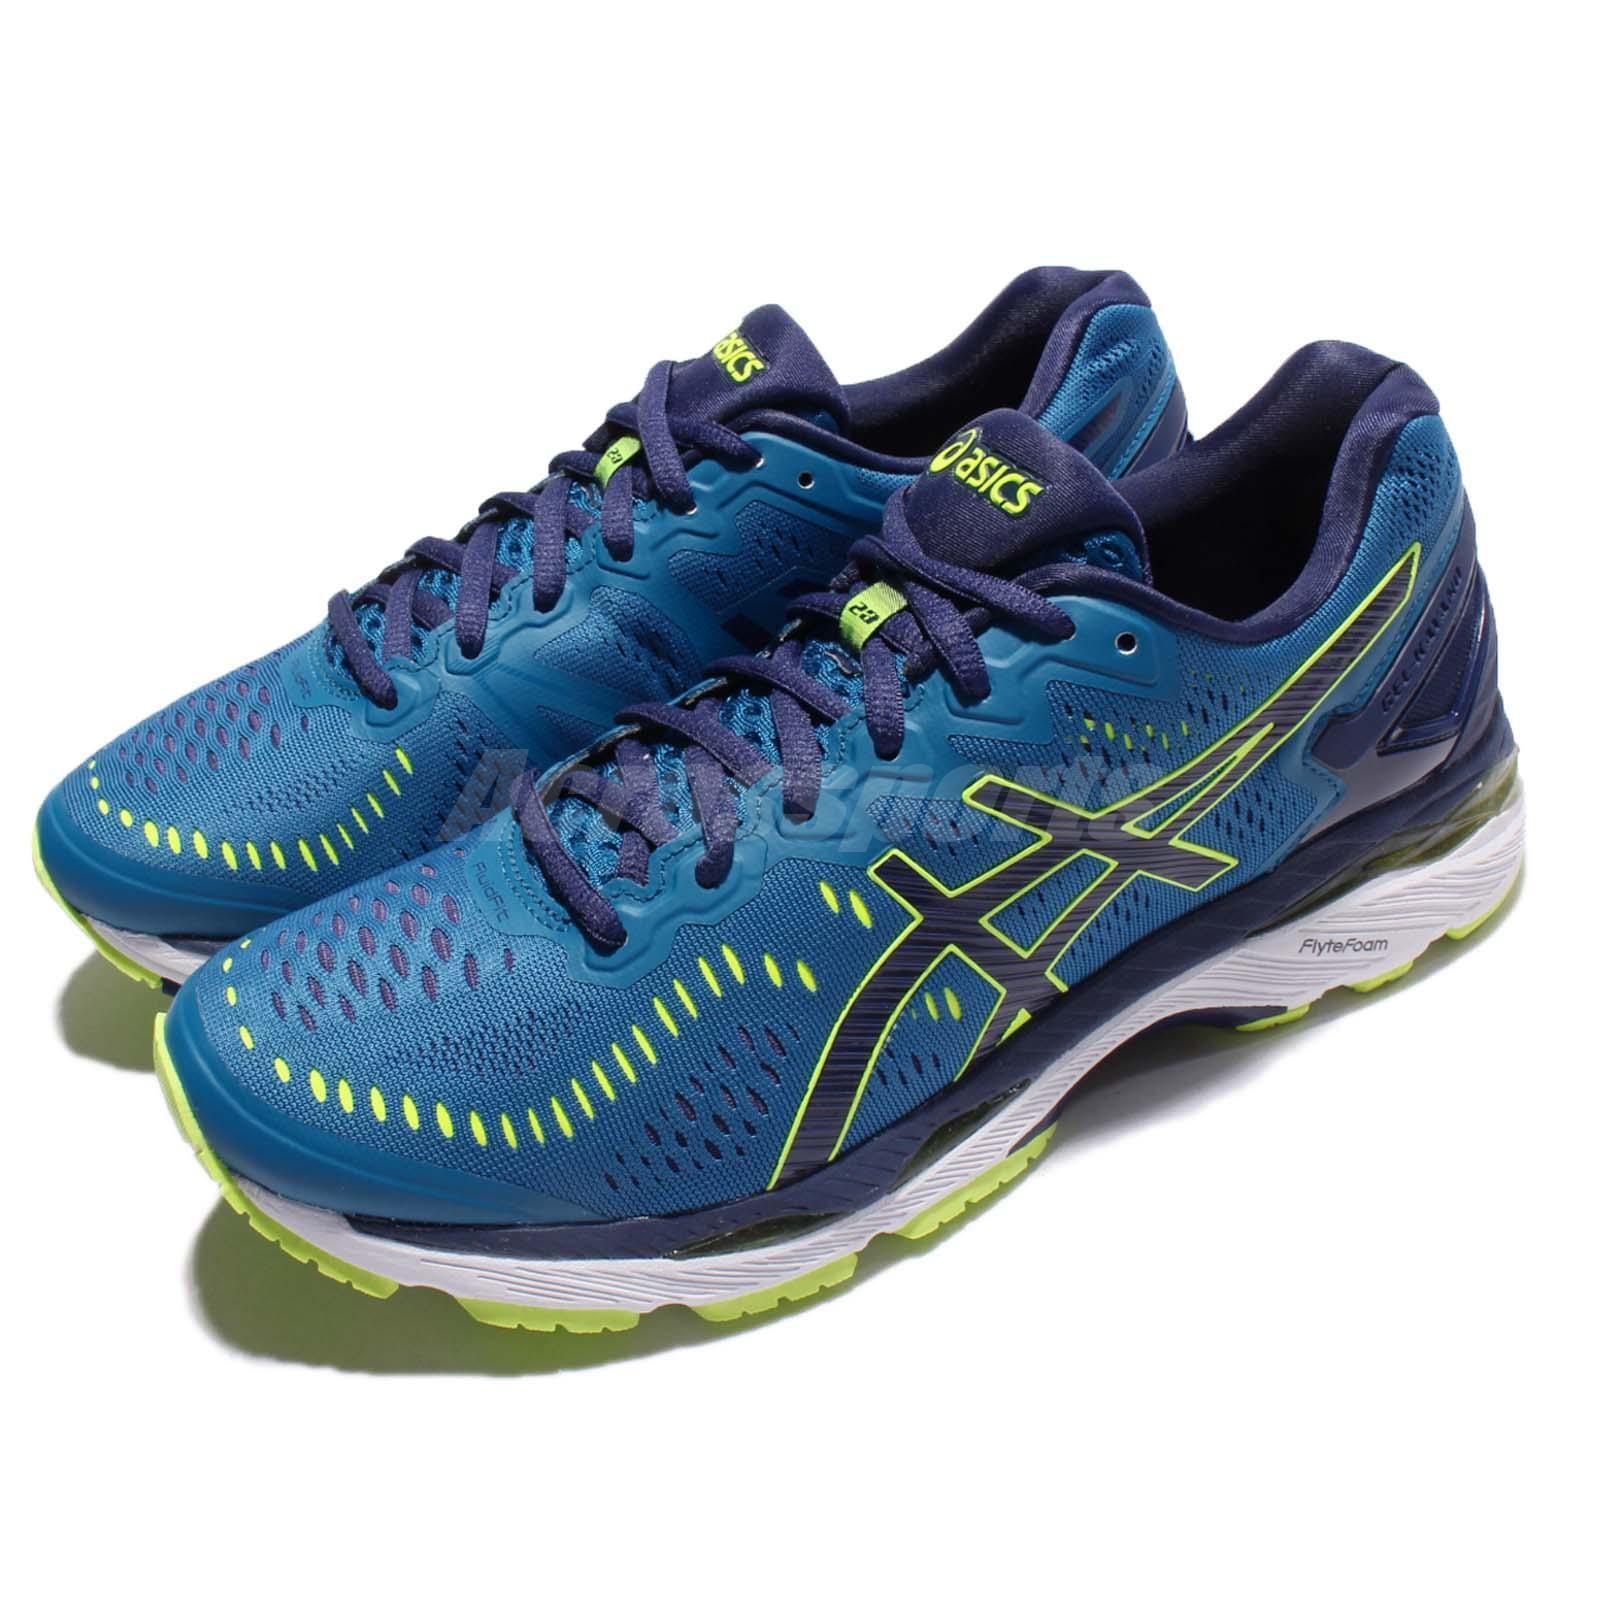 Asics Gel-Kayano 23 blueee  Yellow Men Running shoes Sneakers Trainers T646N-4907  honest service